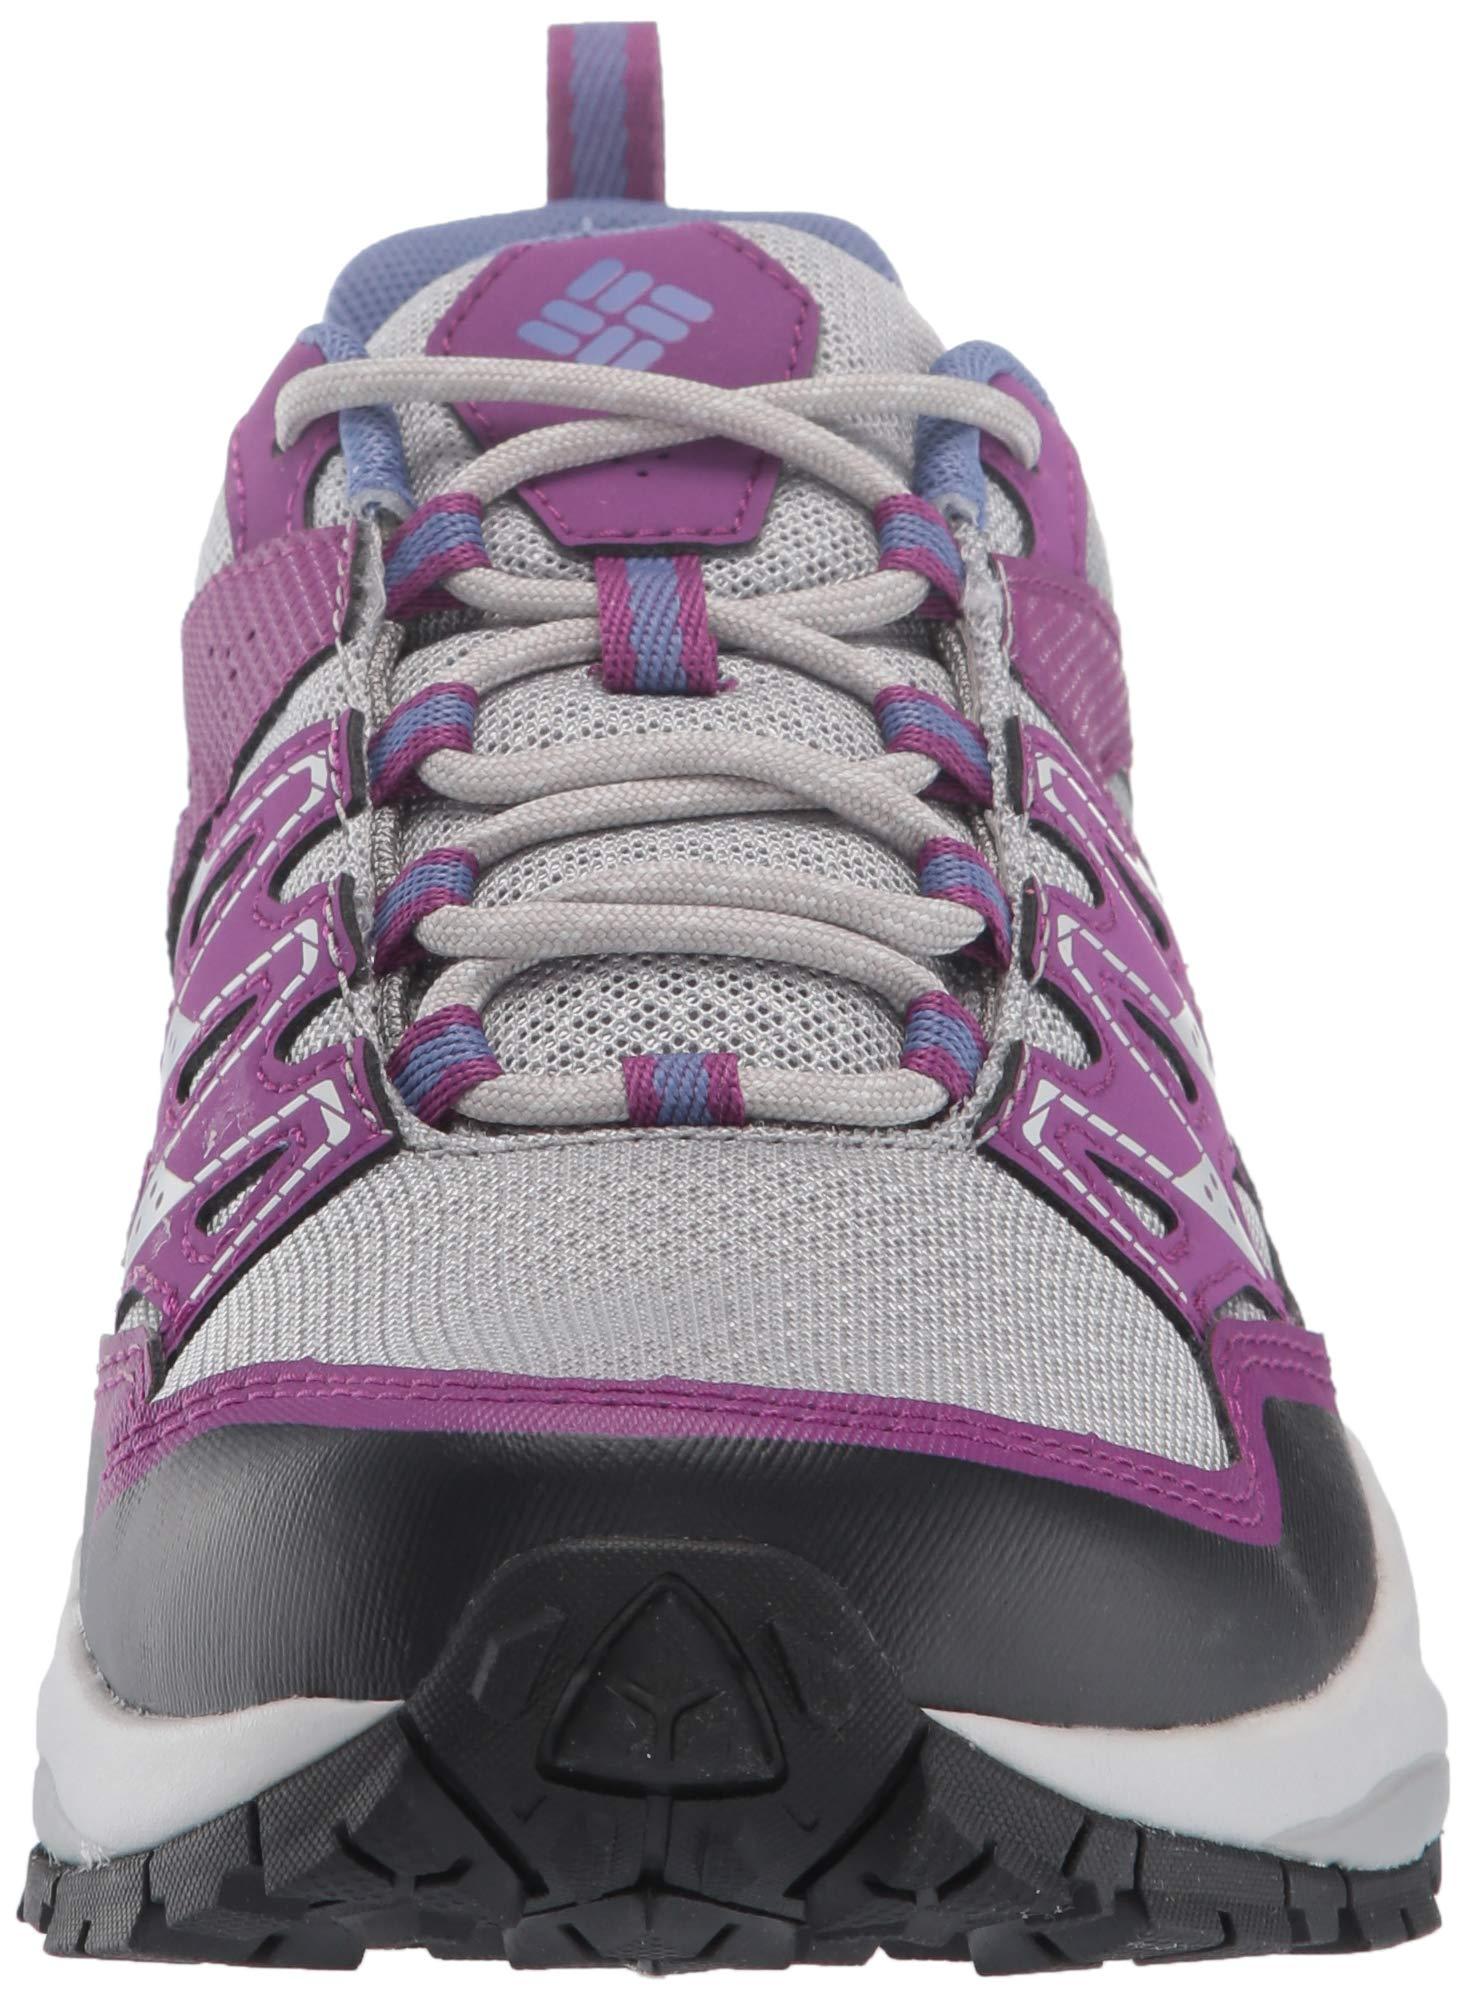 81sgvC0yJML - Columbia Women's WAYFINDER Hiking Shoes